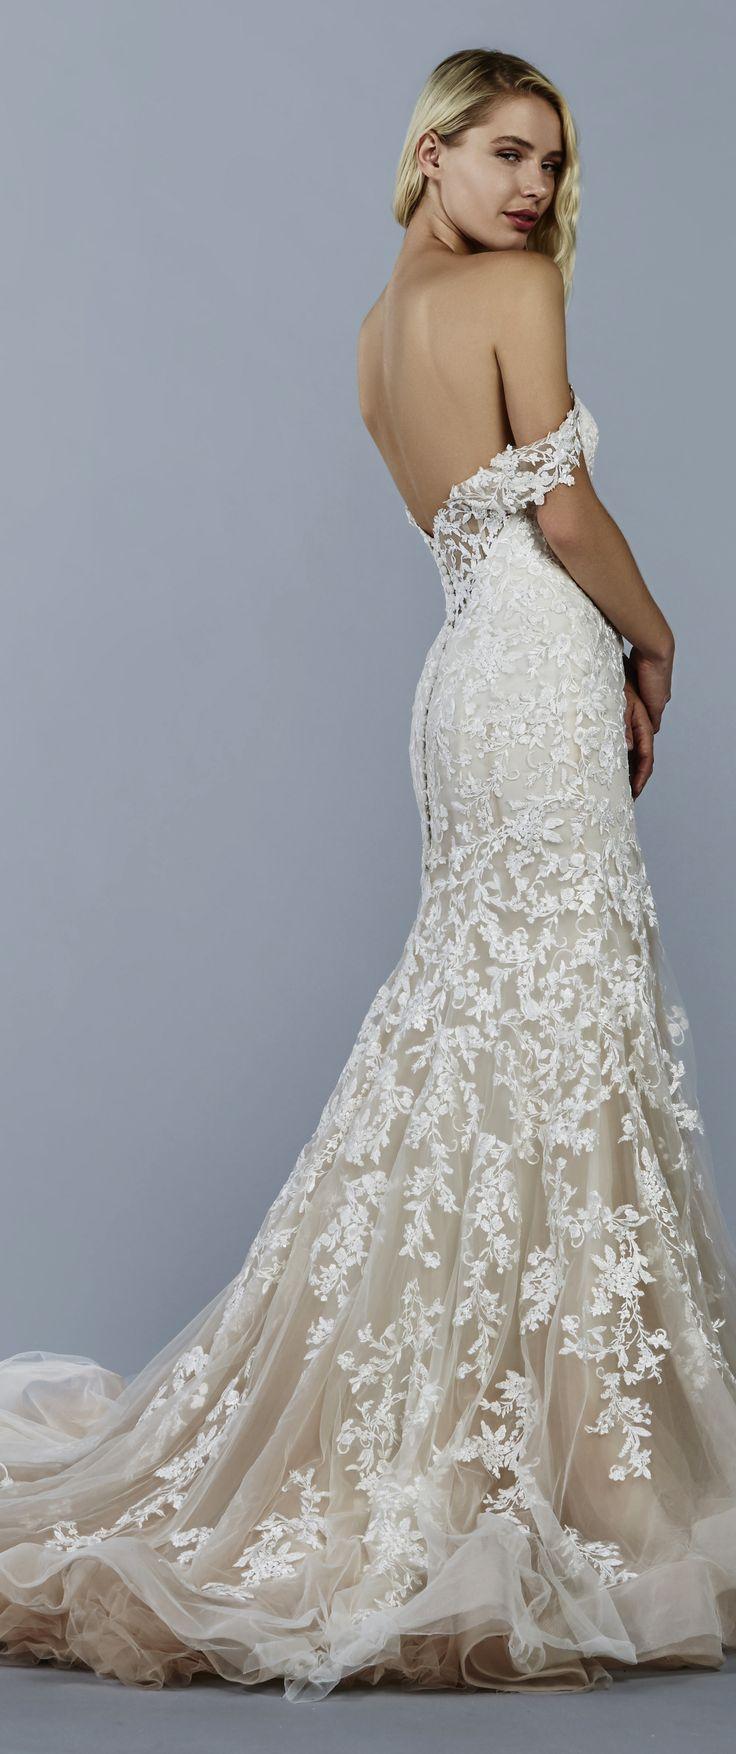 941 best classic-retro wedding dresses images on Pinterest | Wedding ...